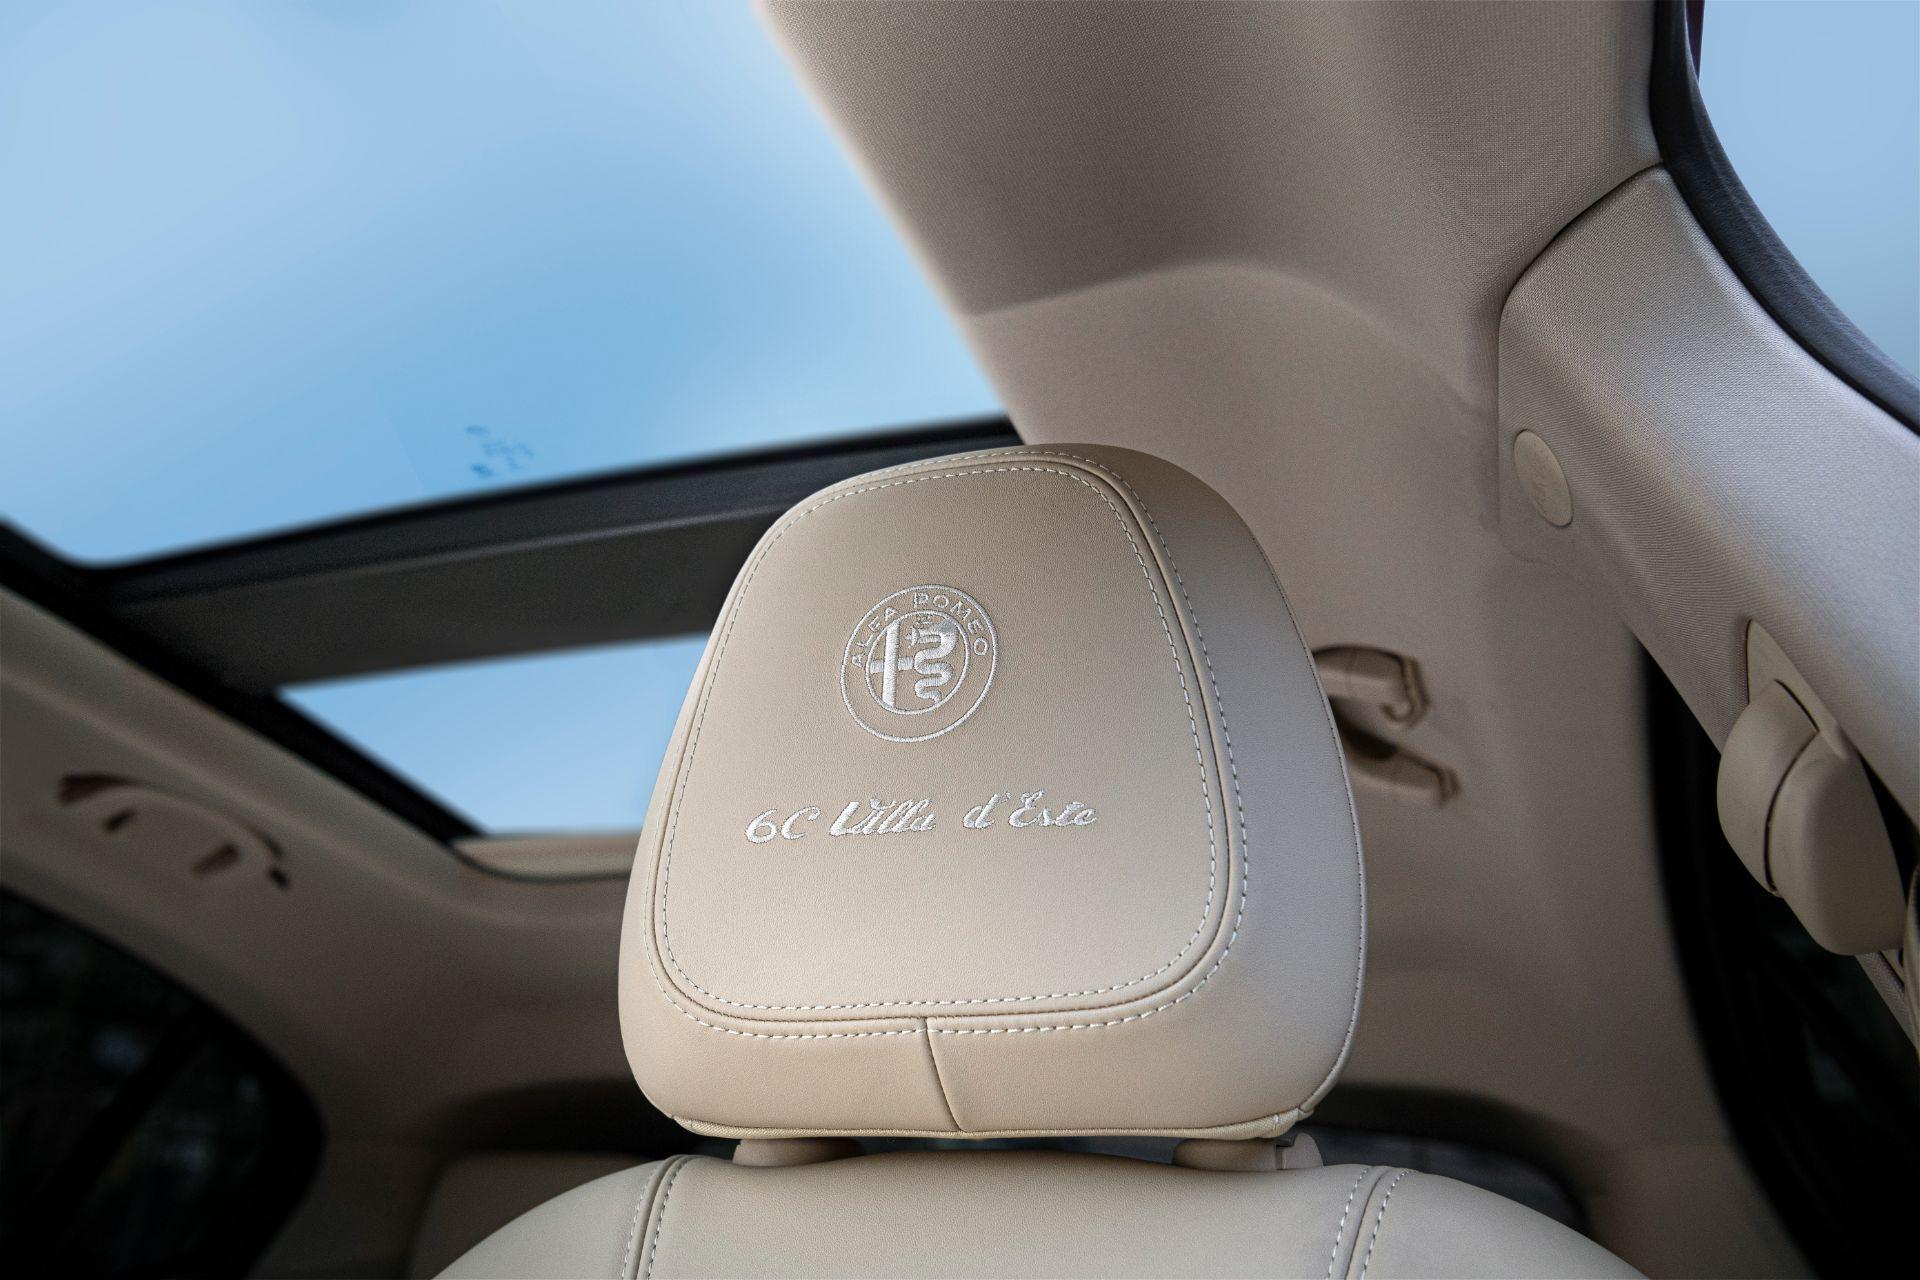 Alfa-Romeo-Giulia-and-Stelvio-6C-Villa-dEste-13